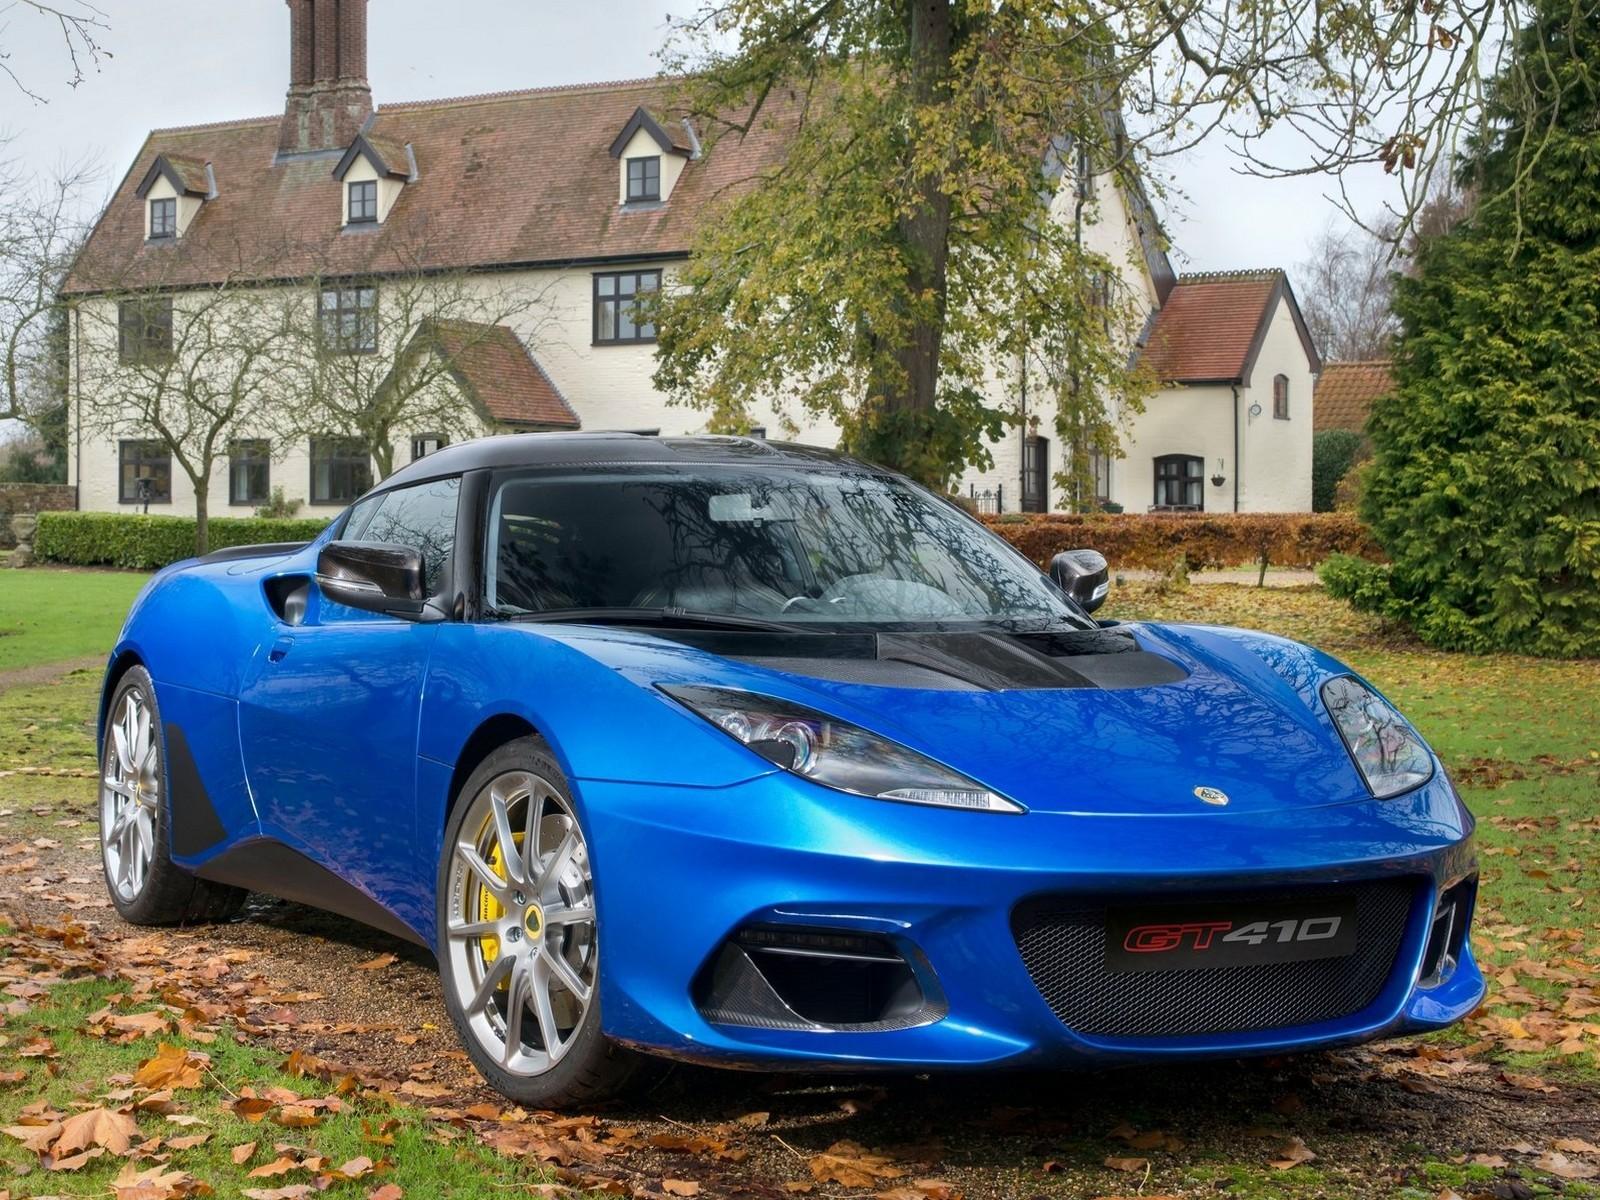 Lotus Evora GT410 Sport (2018)